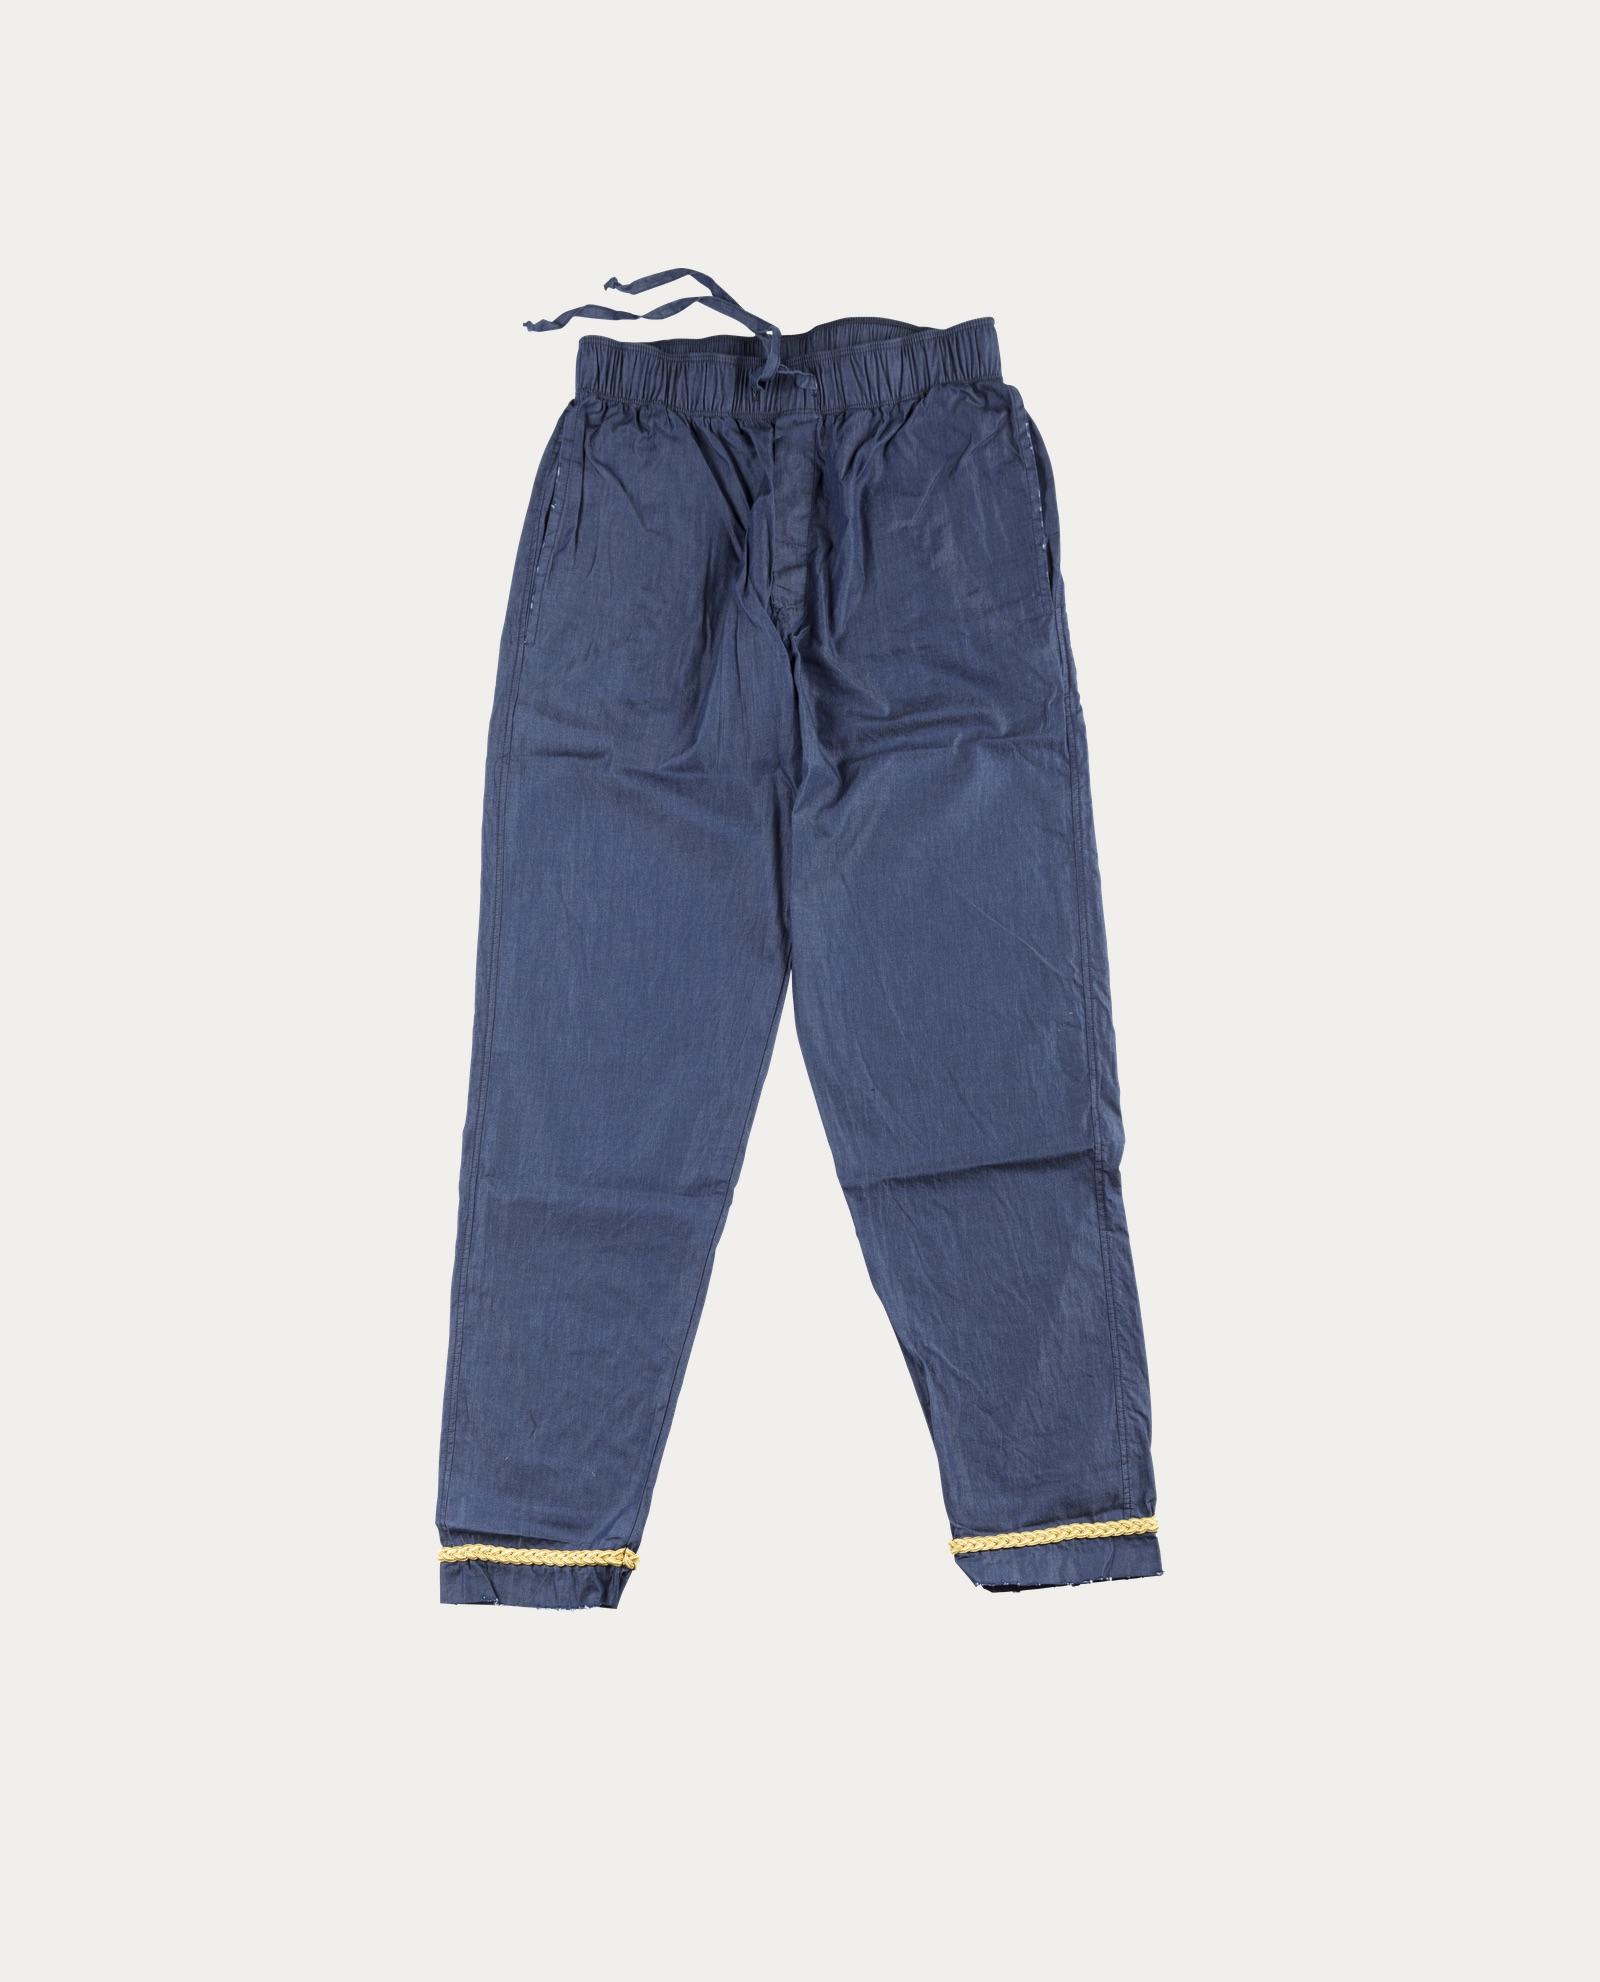 pyjama_marine_galon_or_1